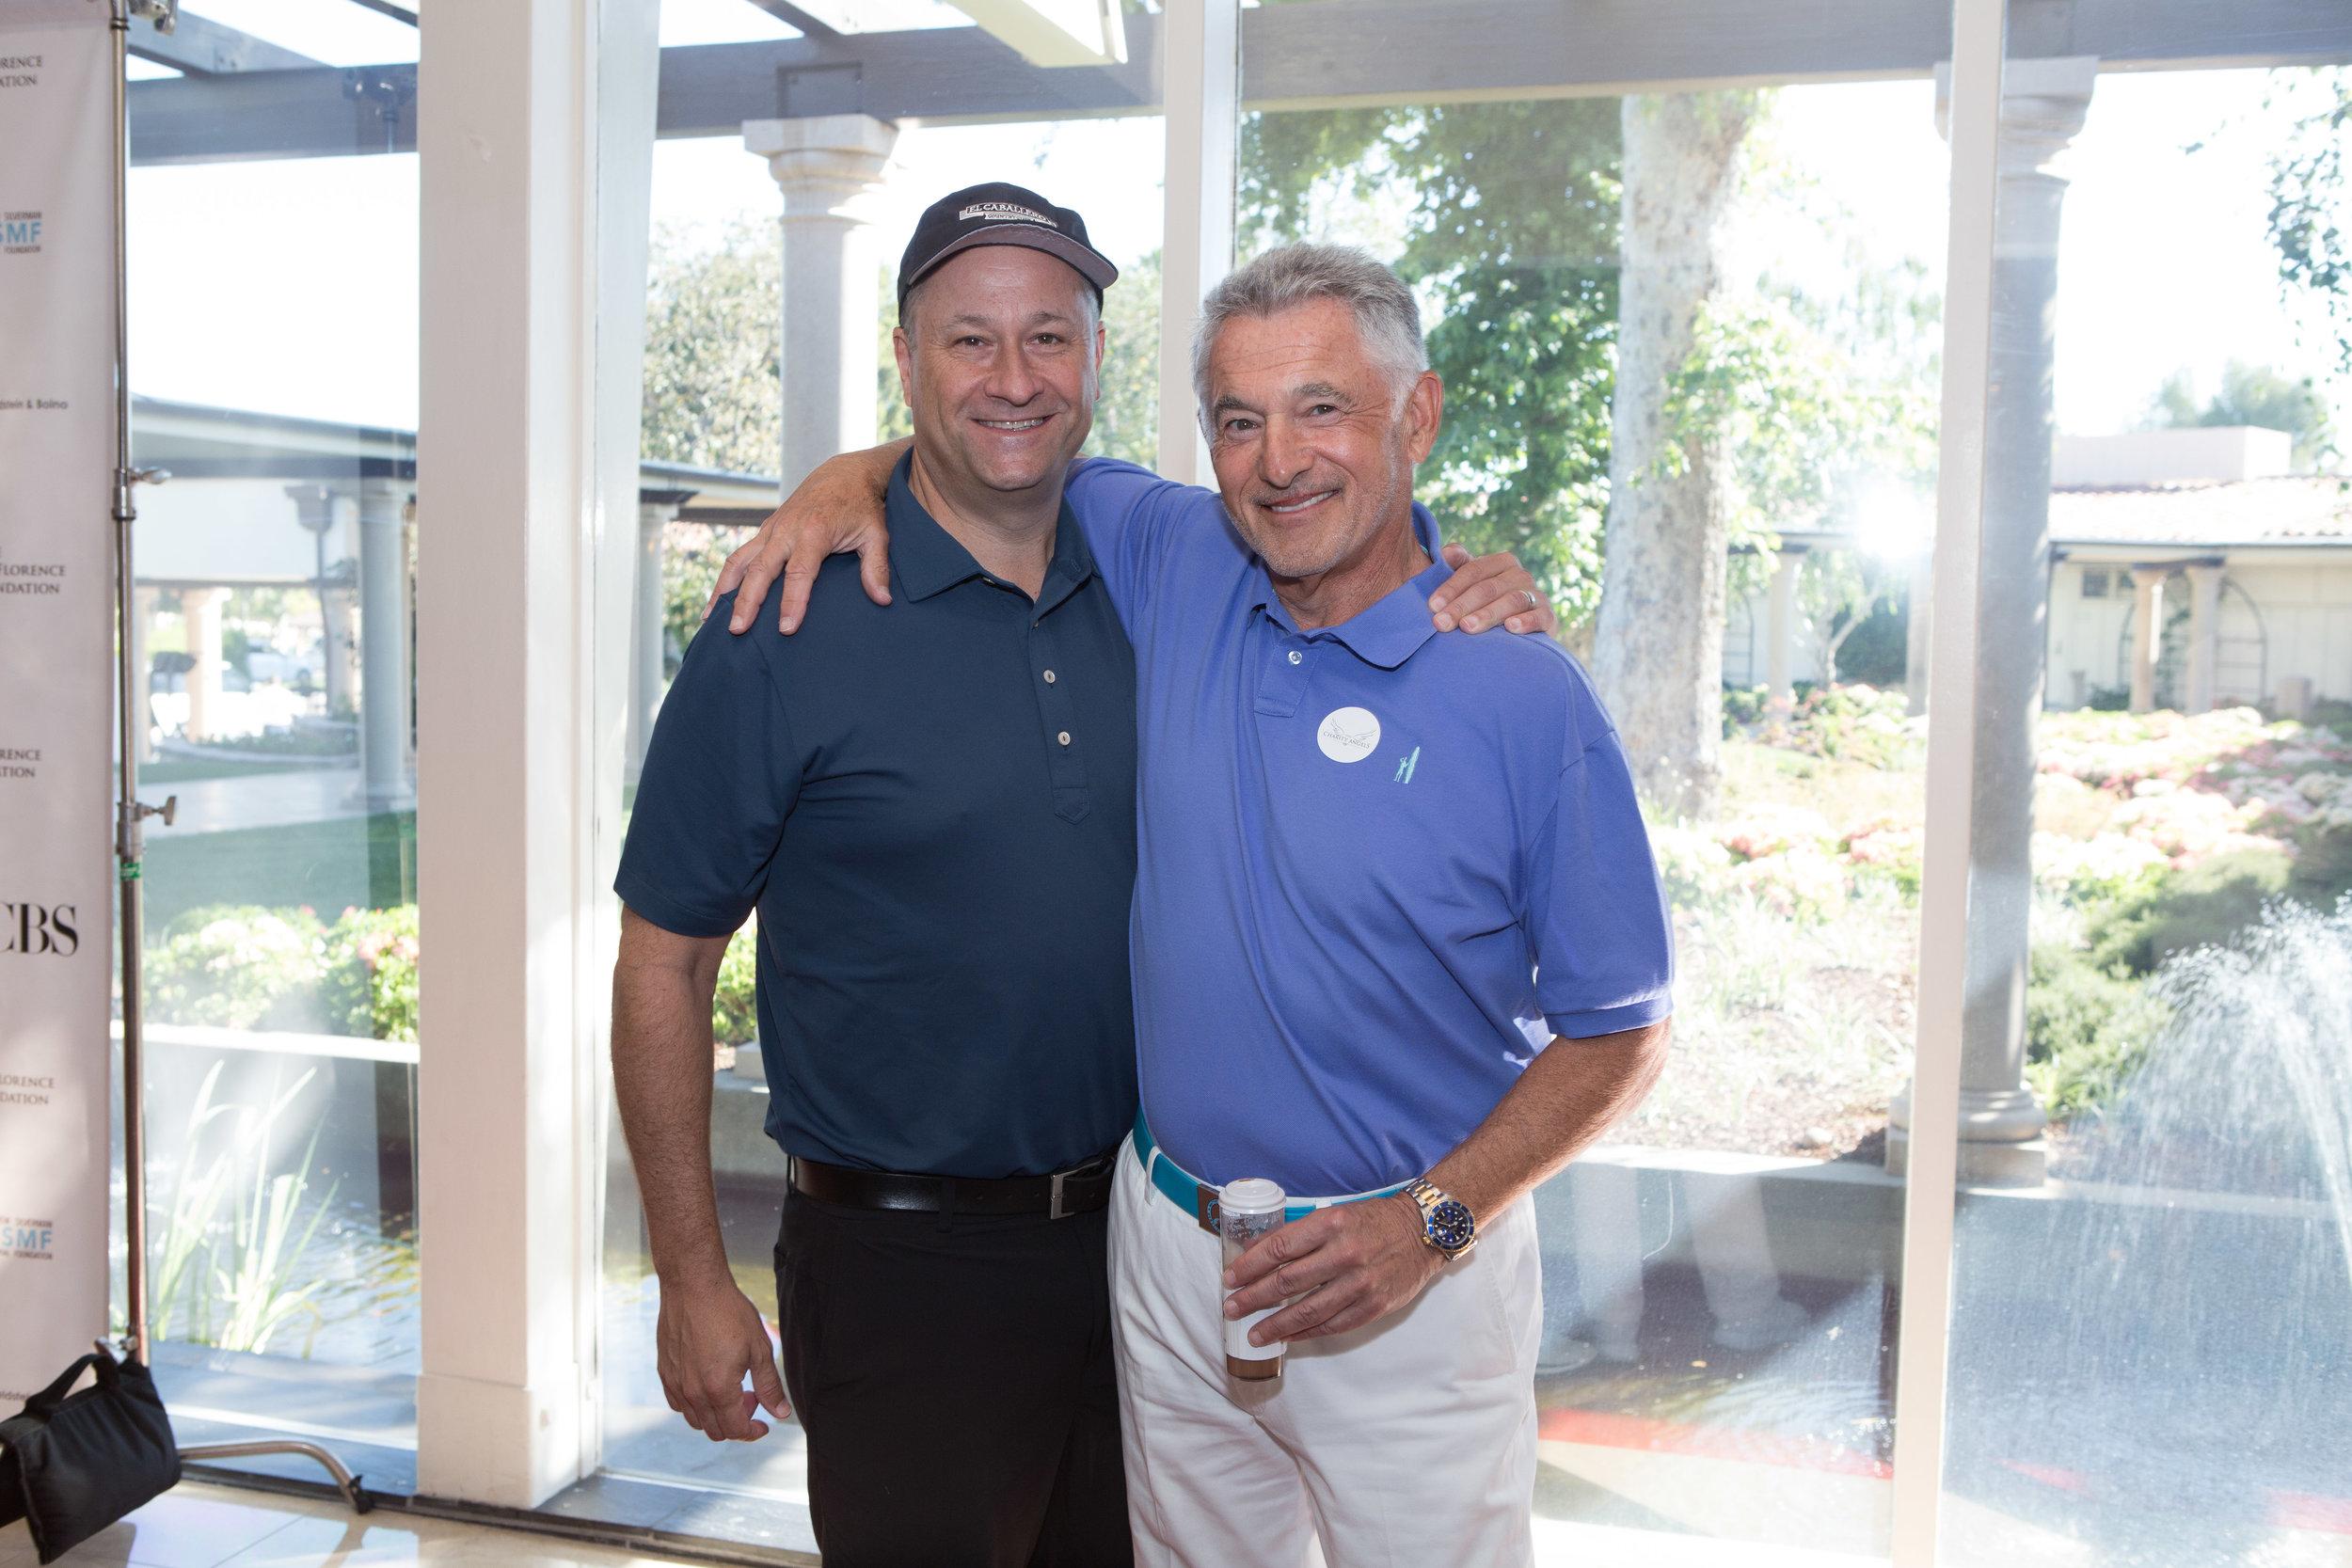 IMG_7663-Ron & Golfer.jpg